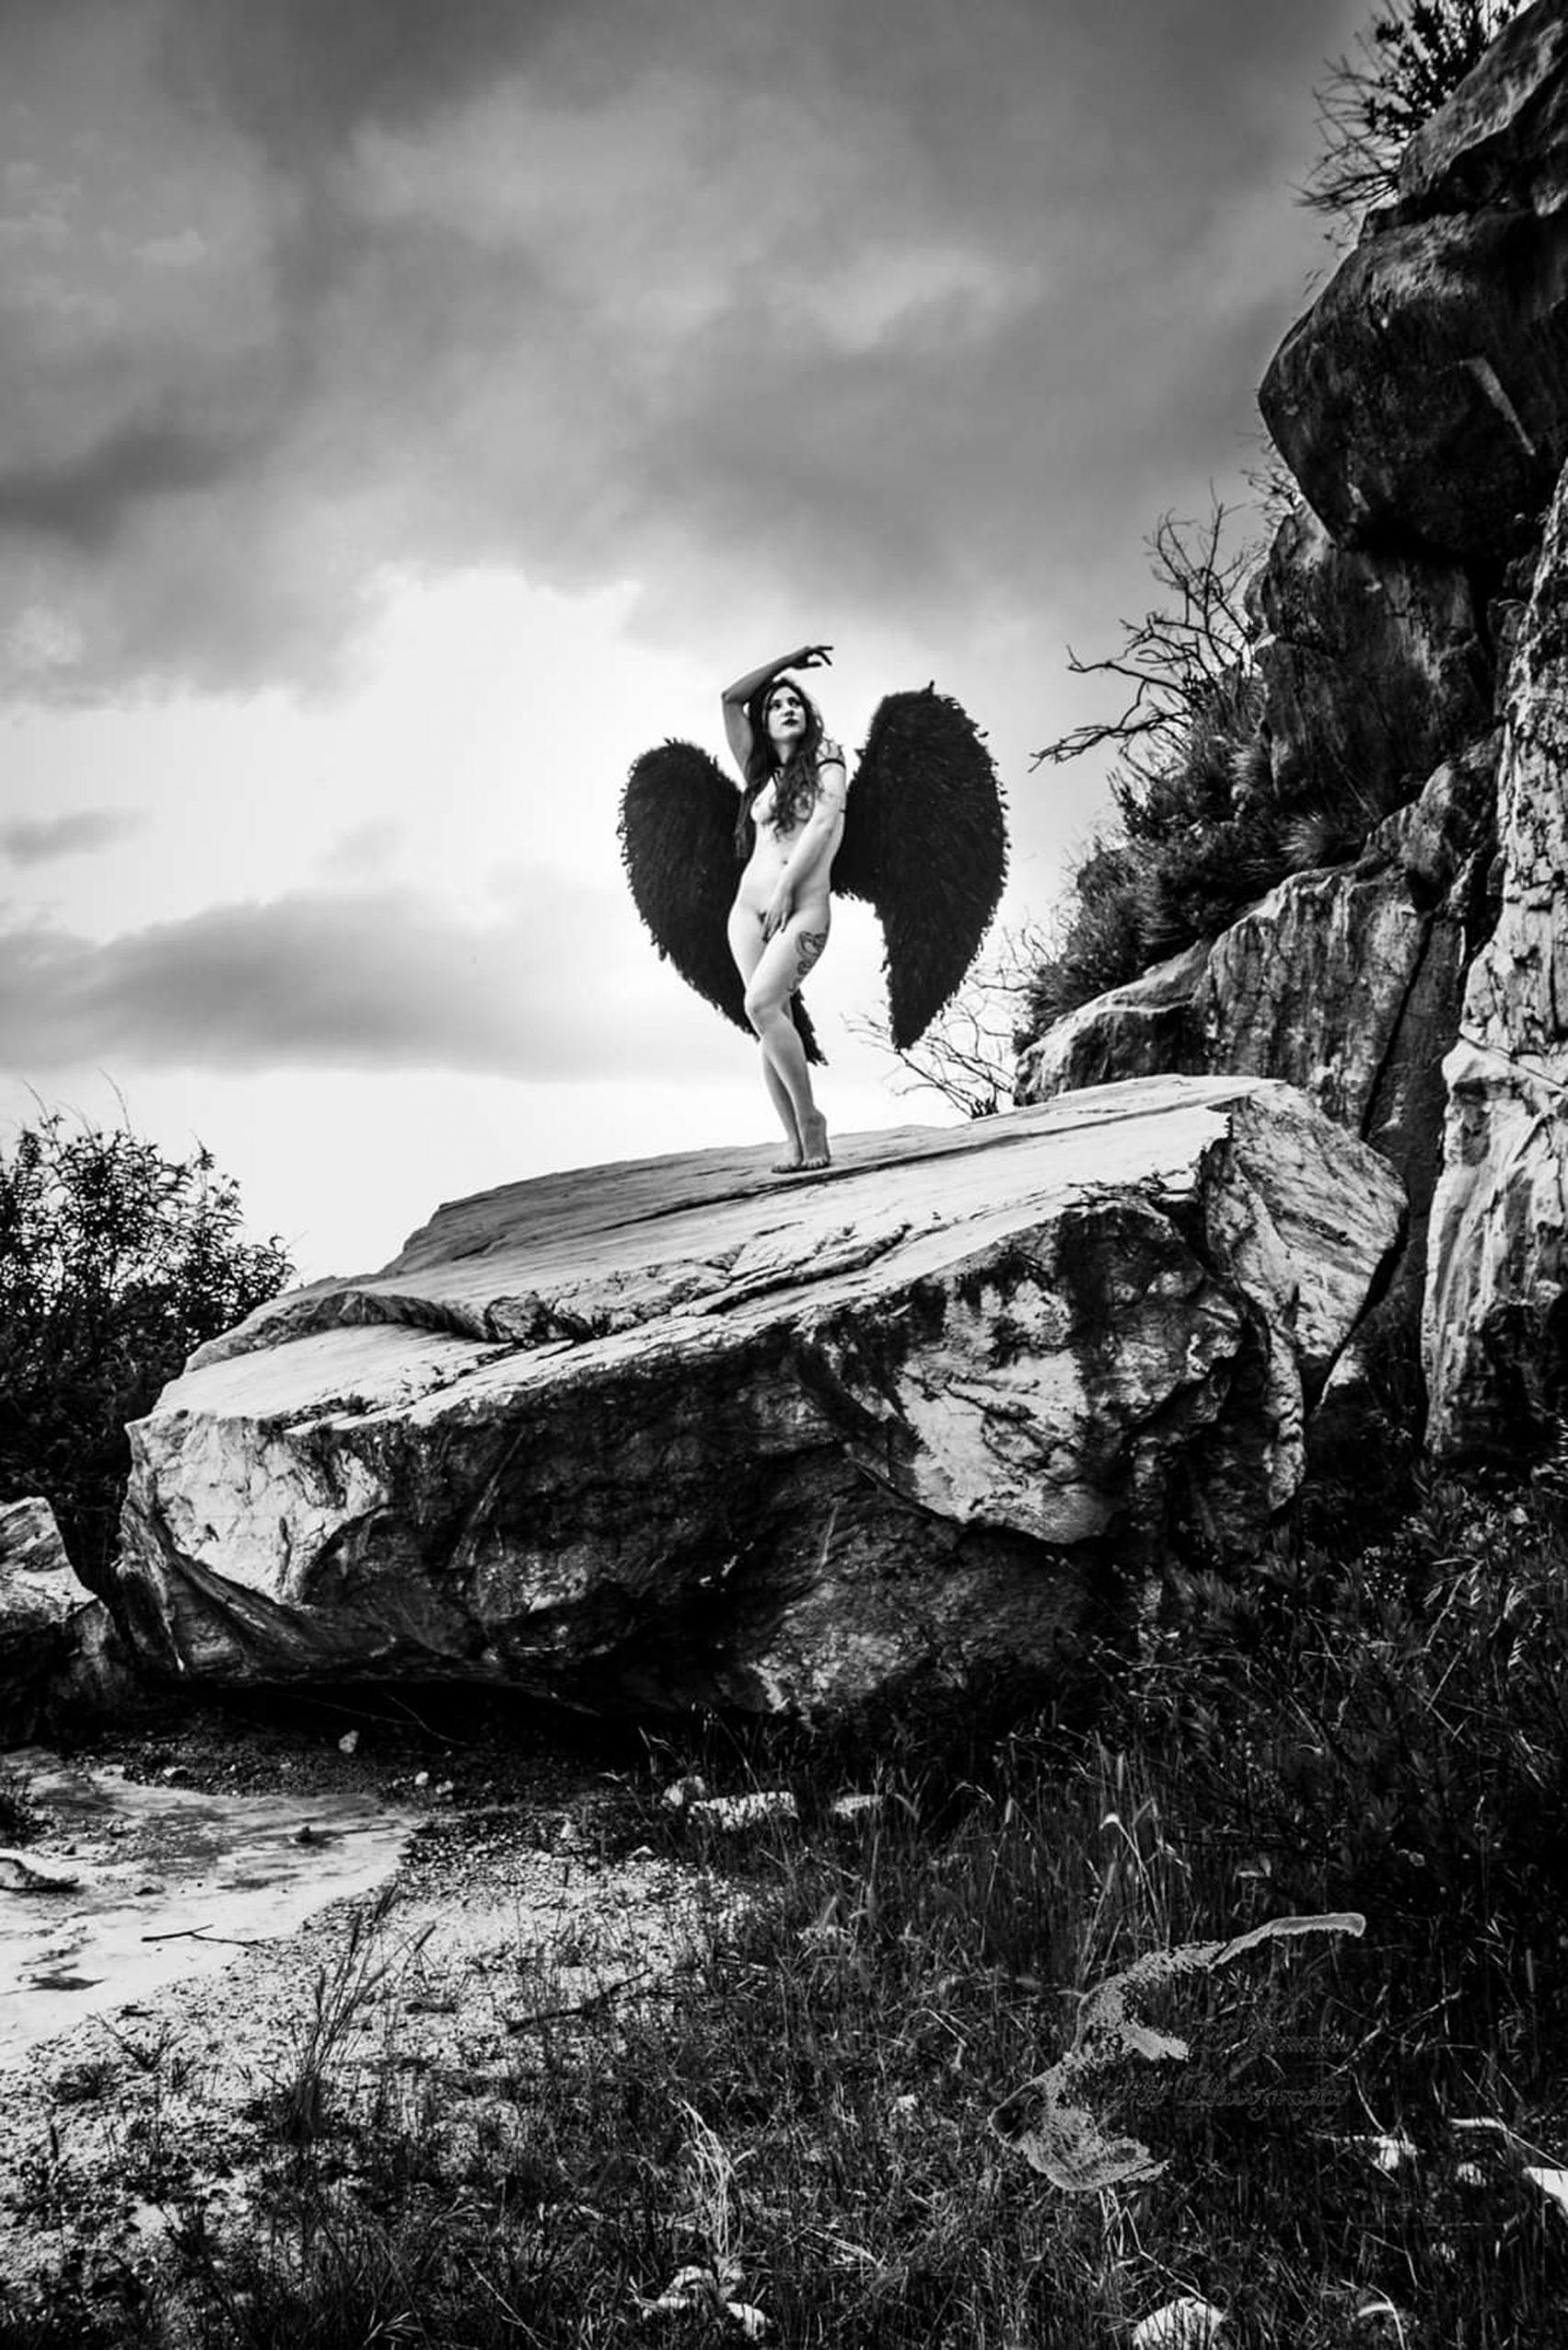 Categorie: Portrait, Boudoir & Artistic Nude, Glamour - Photographer: Luana Cimmino - Model: Kiara Aradia- Location: Massa, MS, Italia